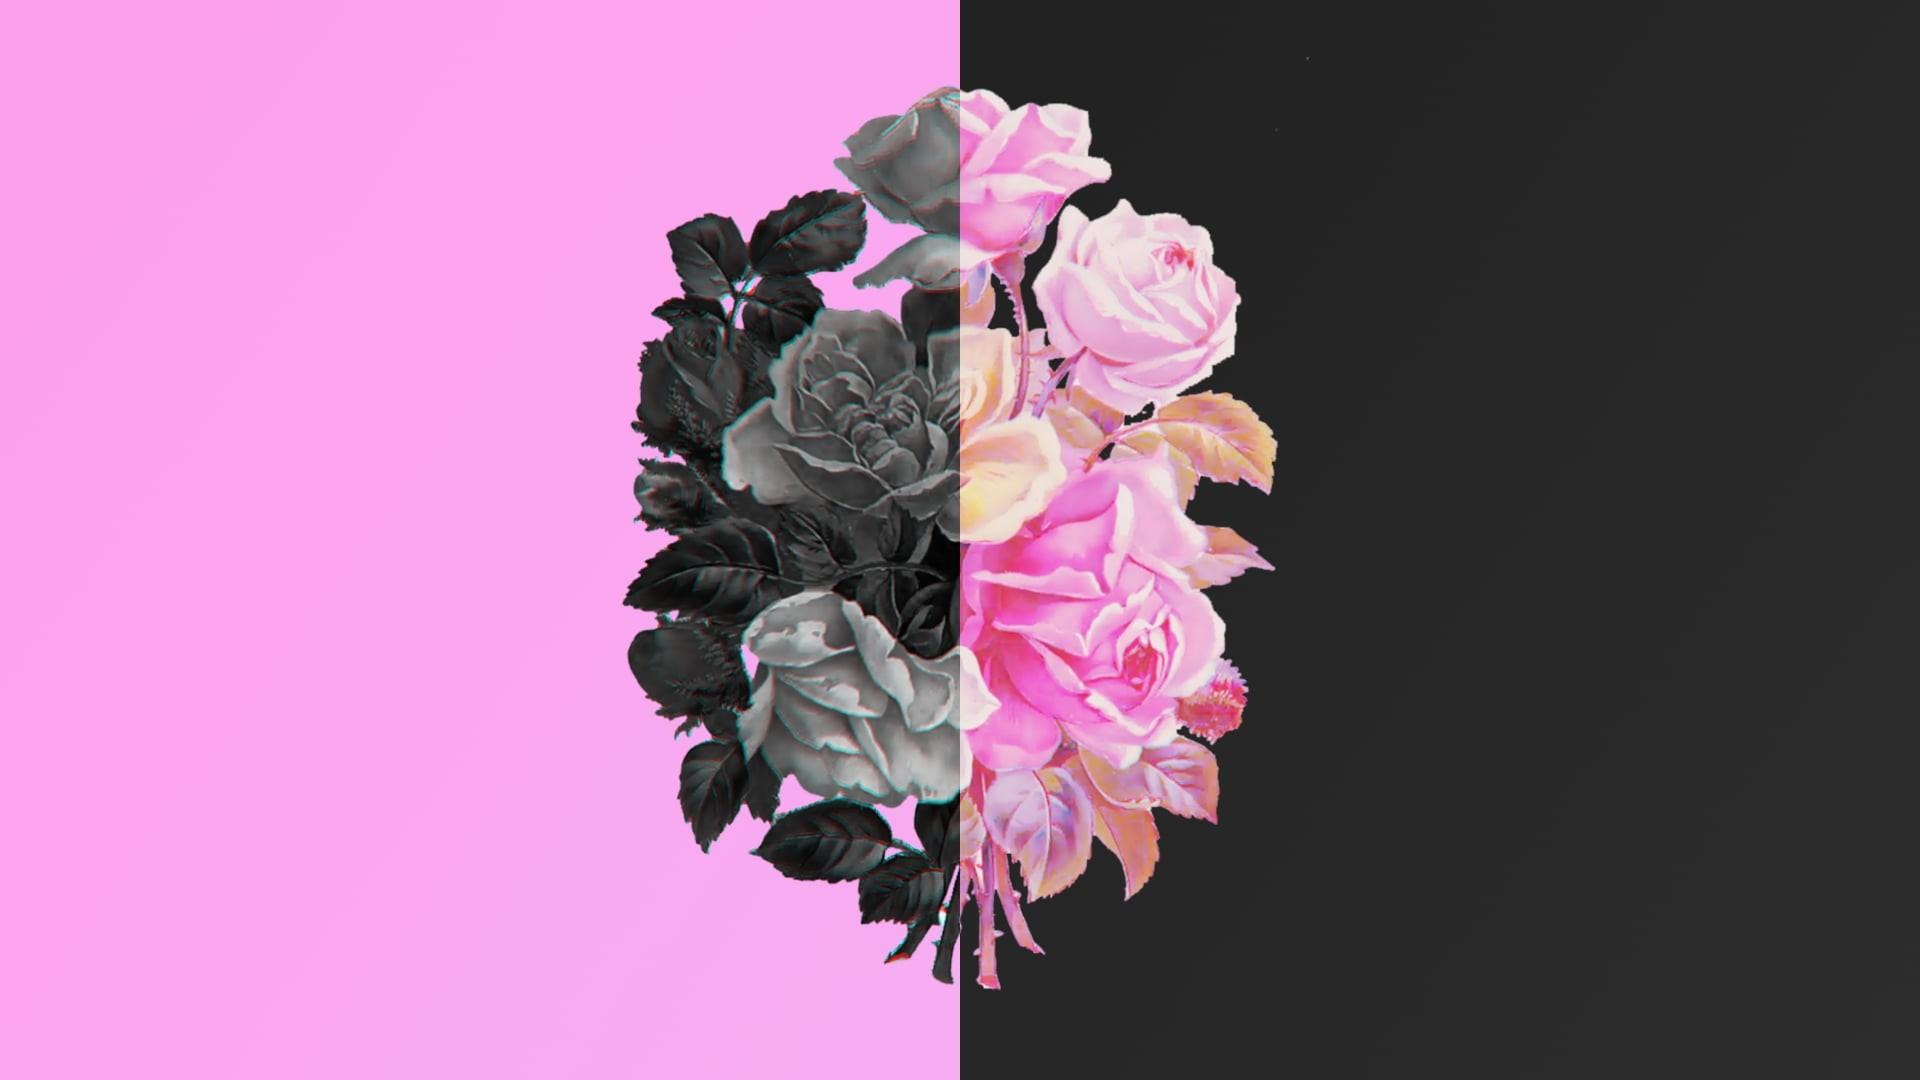 Flower Minimalist Pic